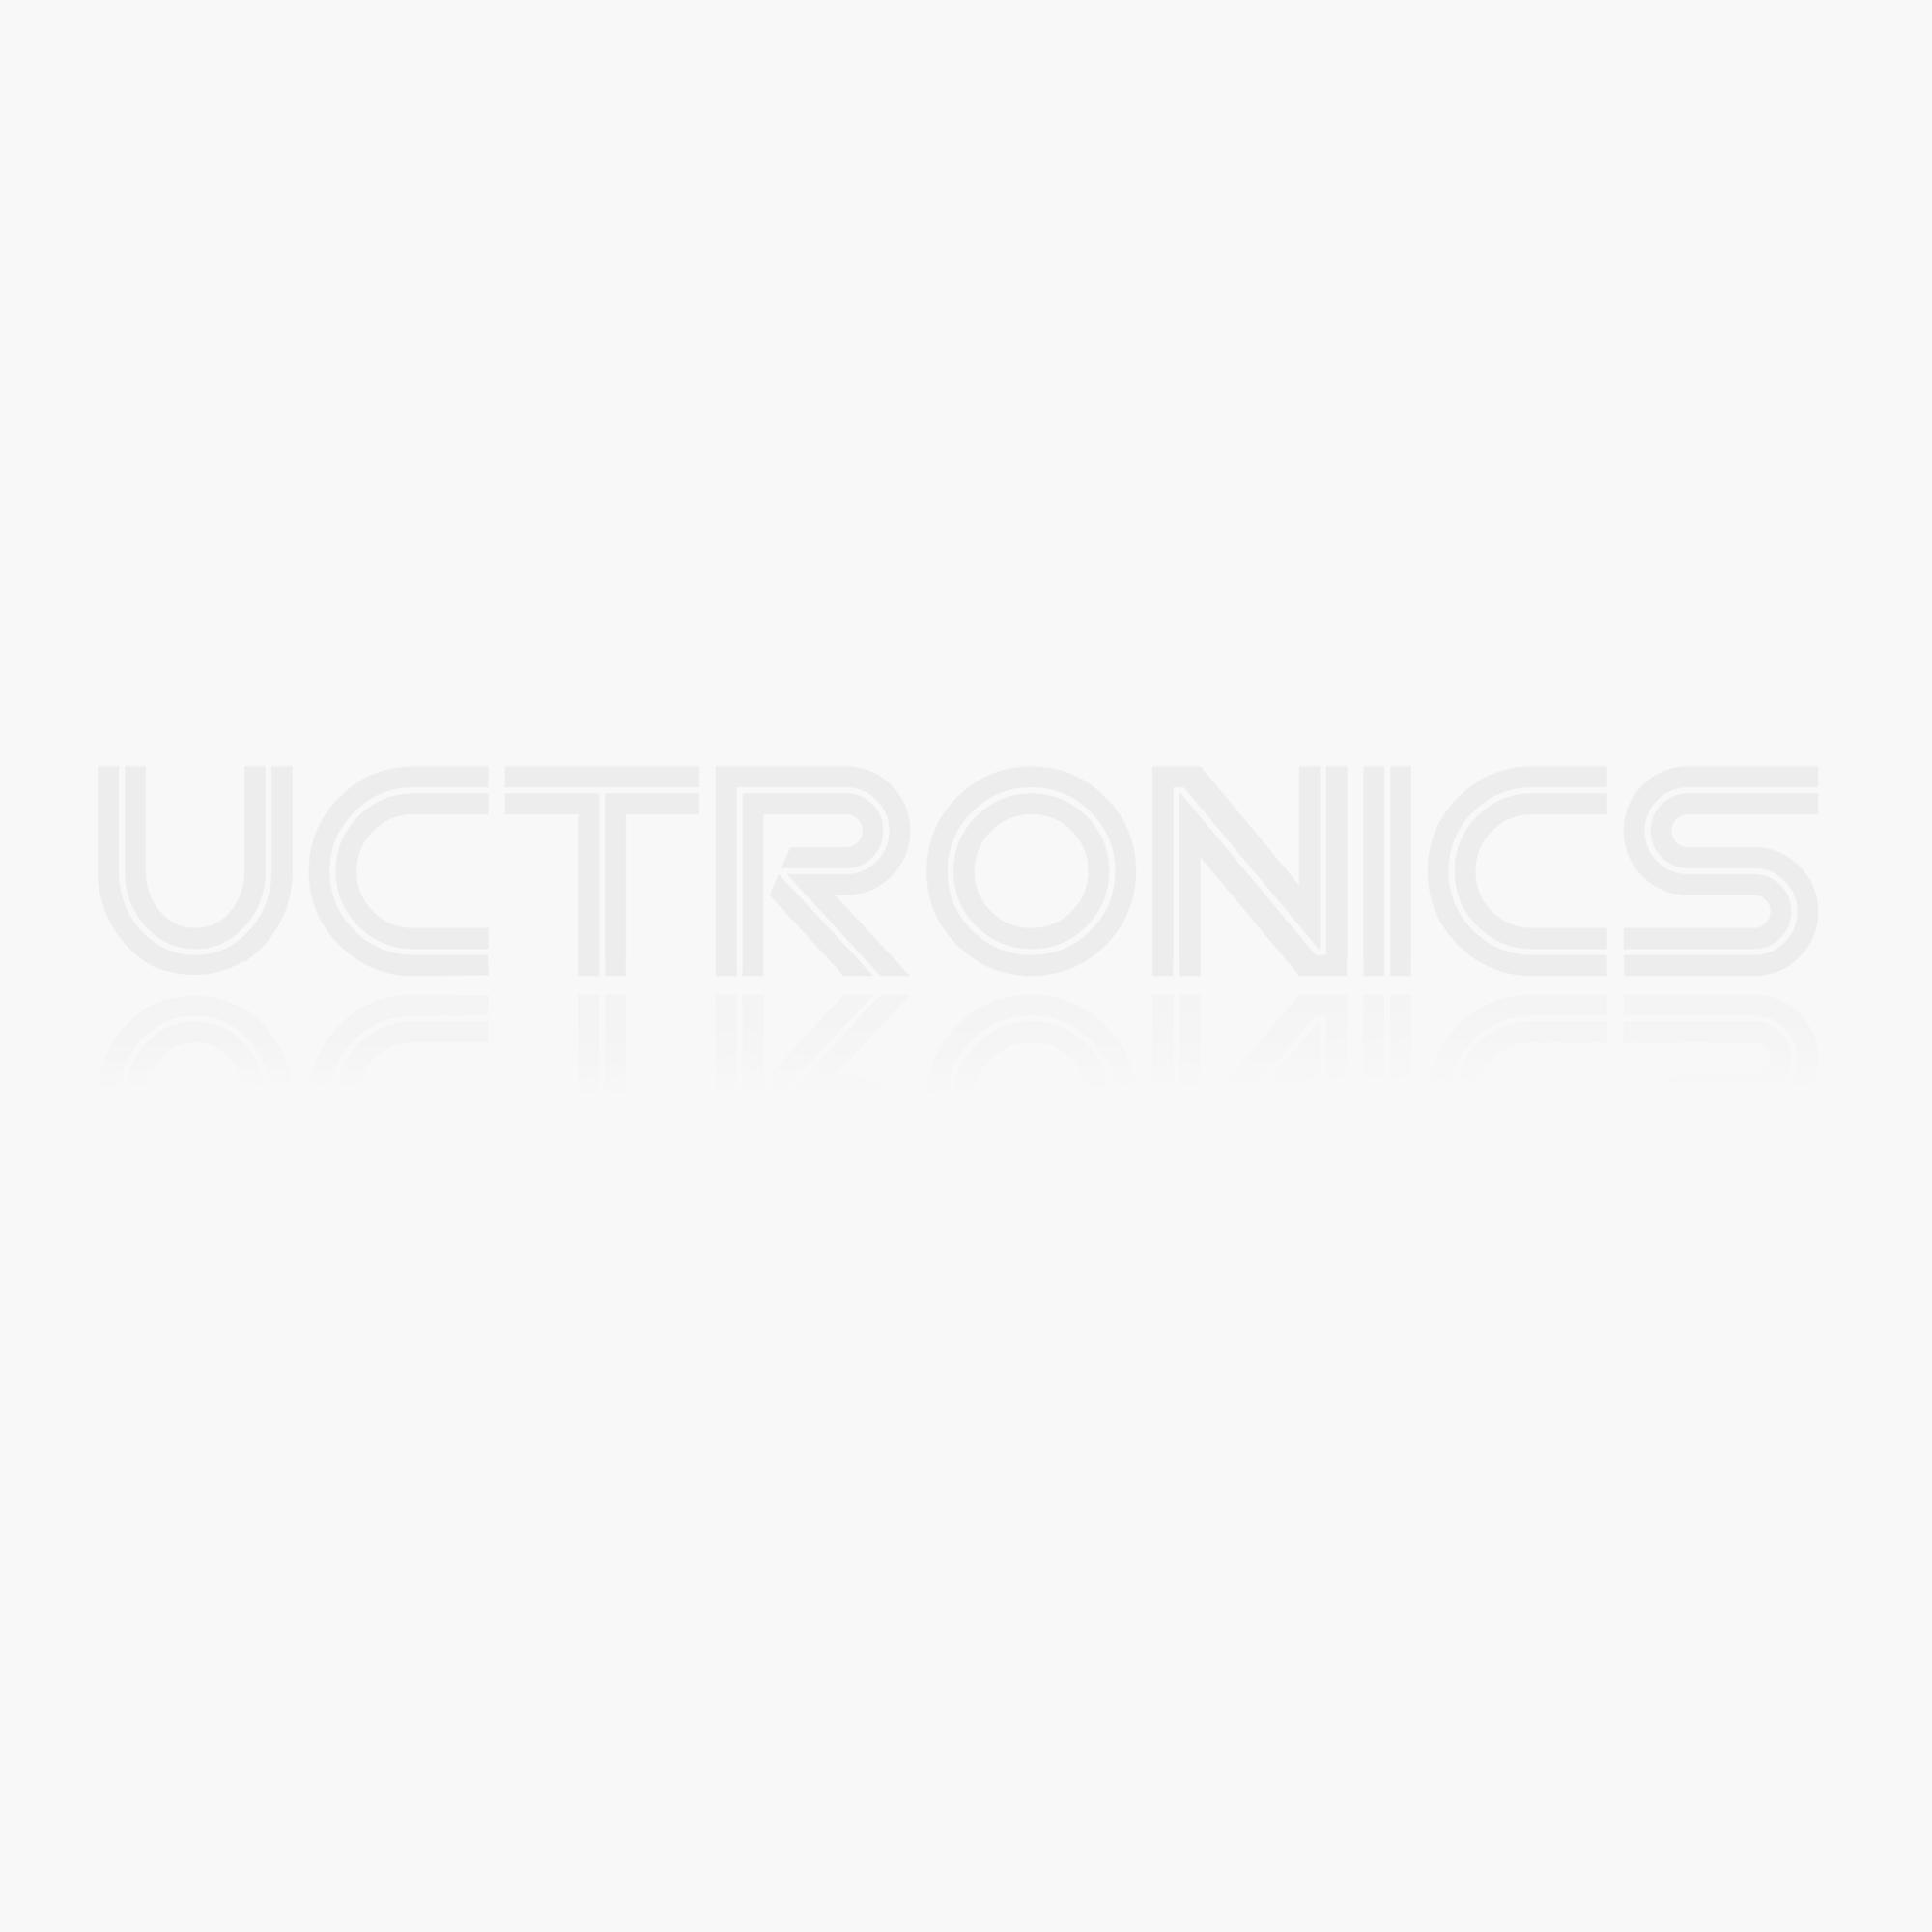 10pcs 1*6 6Pin Single Row Straigh 2.54mm Female Header Socket Connector